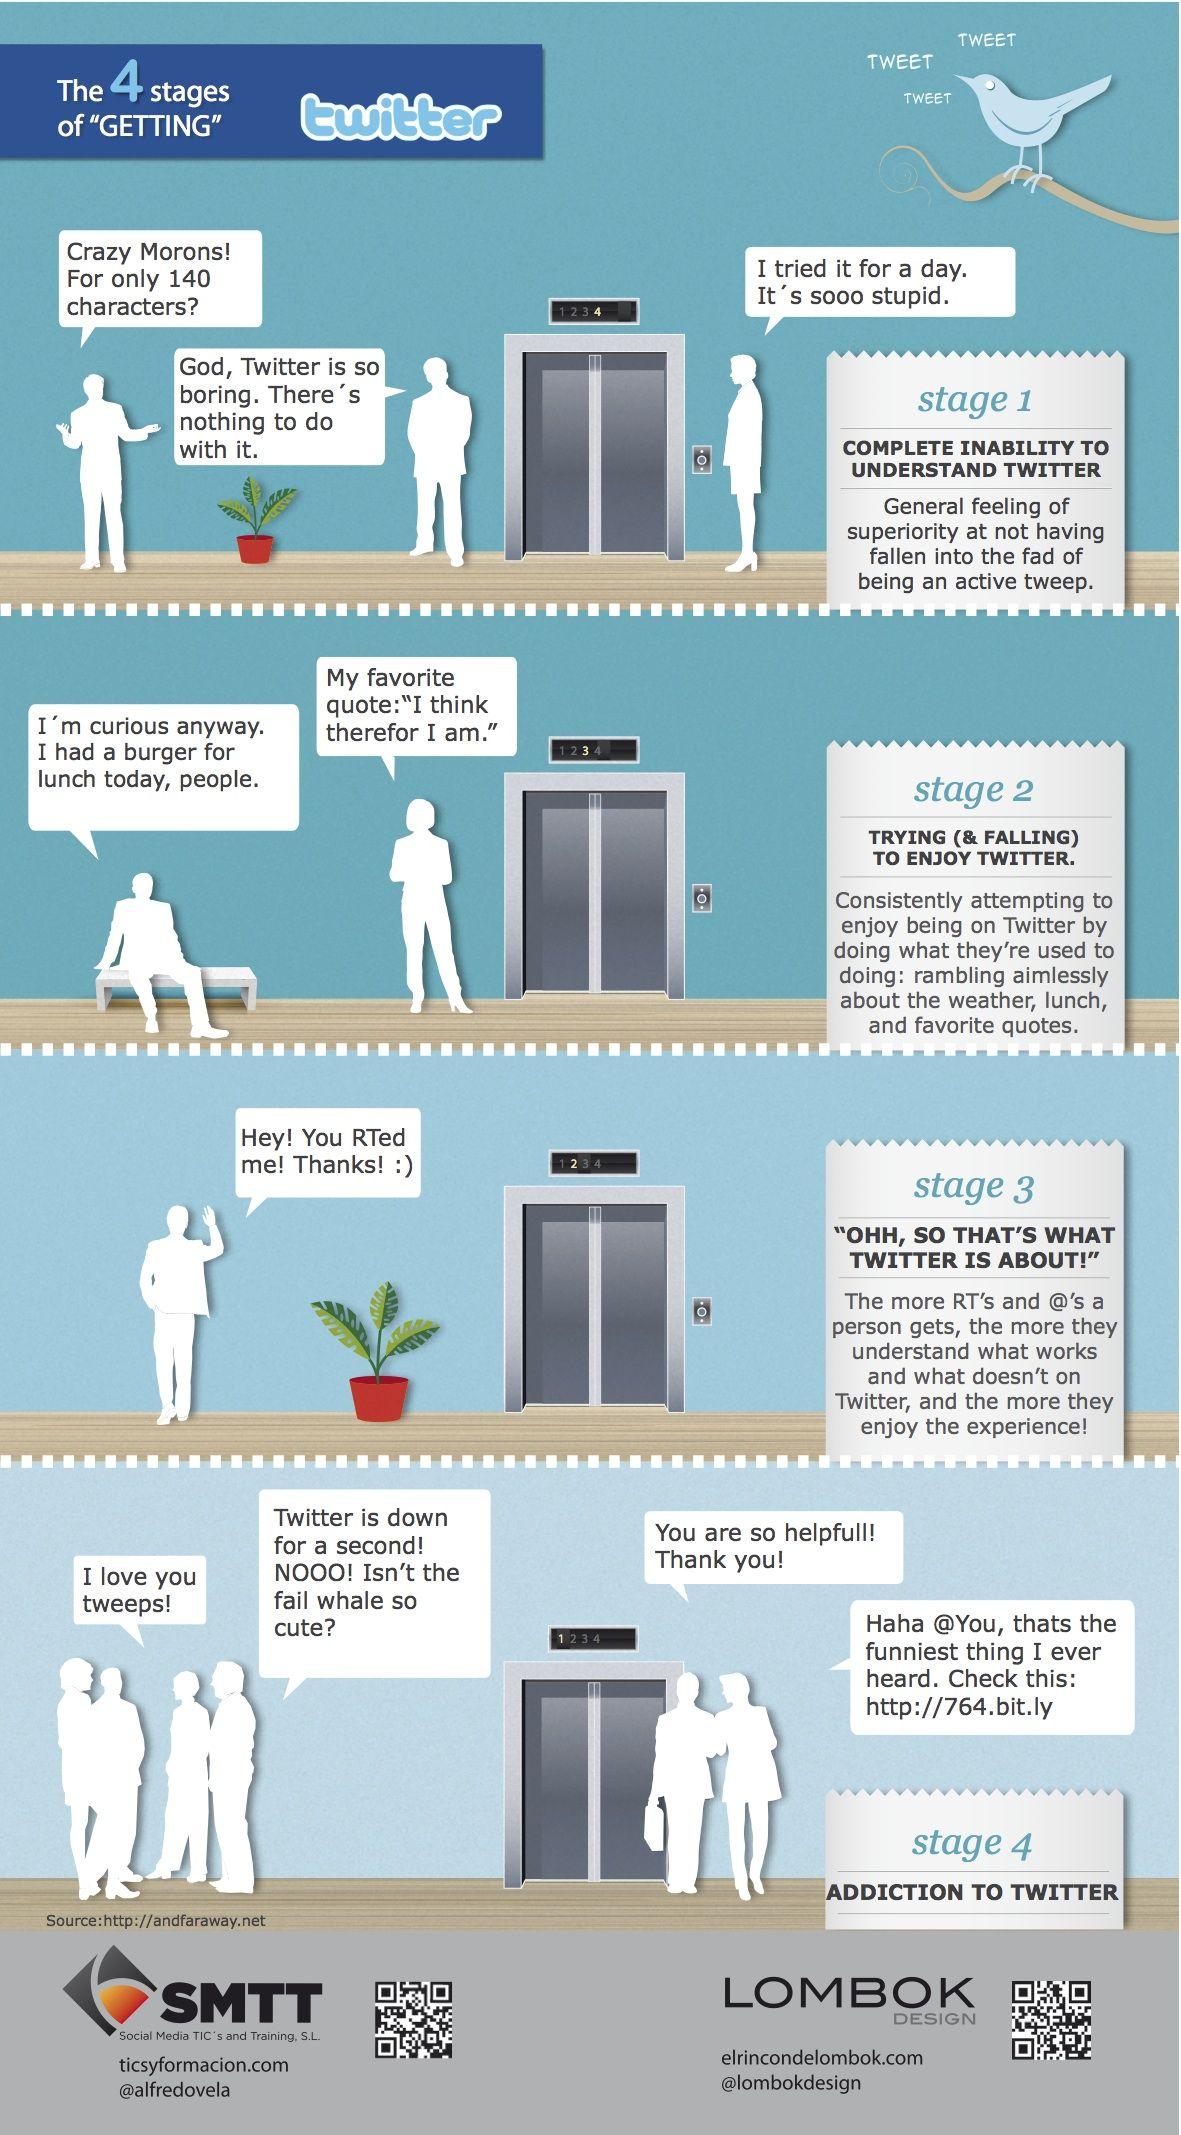 Las 4 etapas para comprender Twitter #infografia #infographic #socialmedia